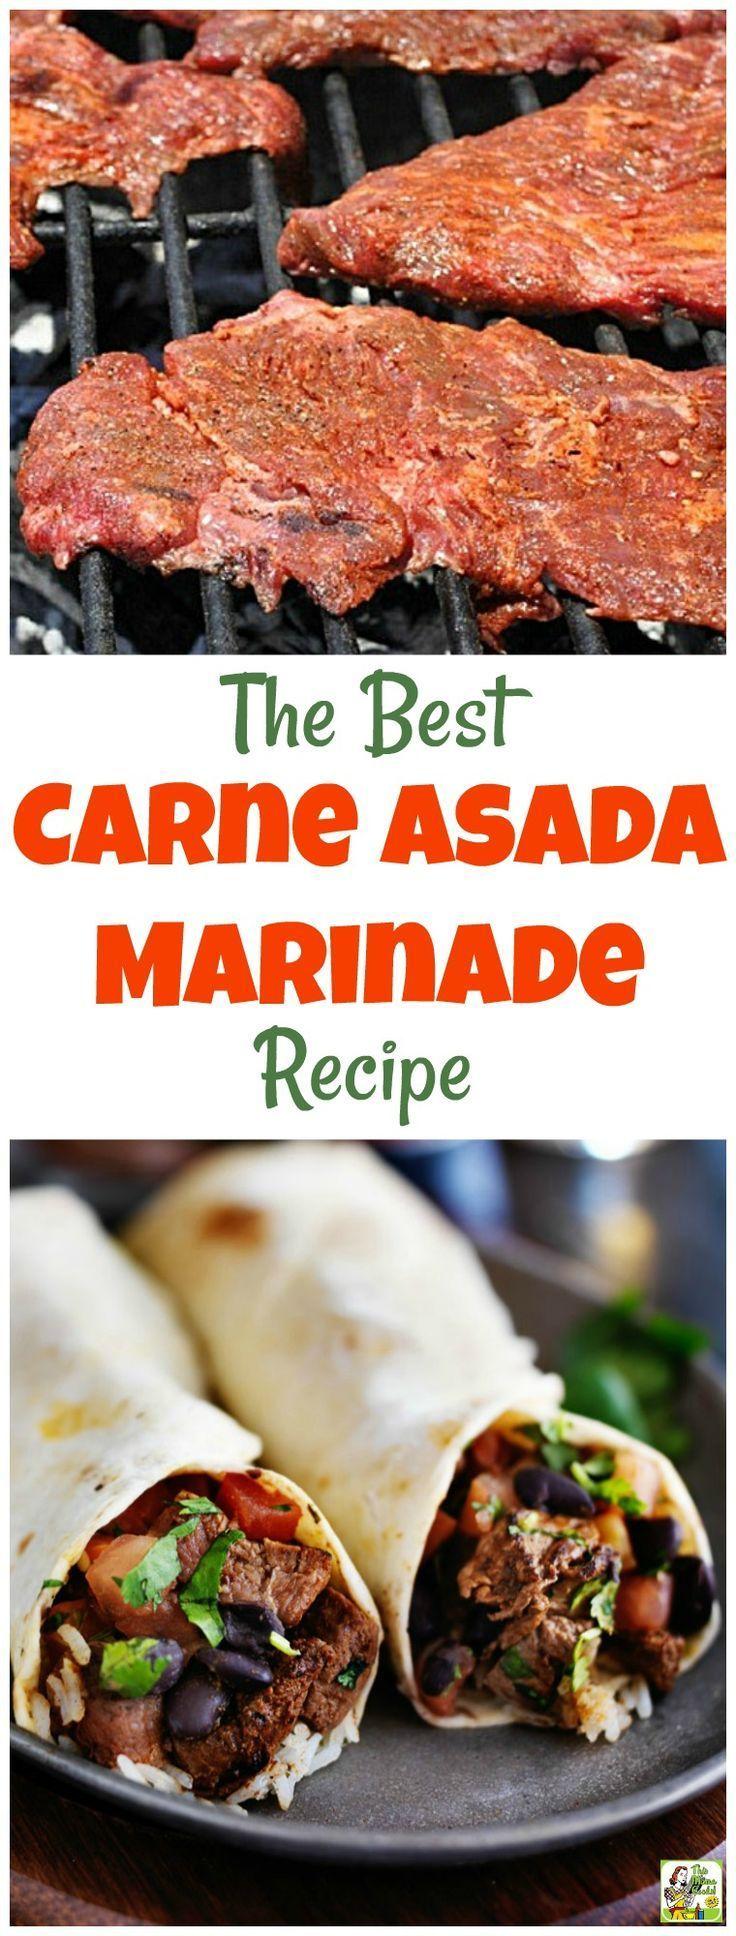 Try the Best Carne Asada Recipe Ever!